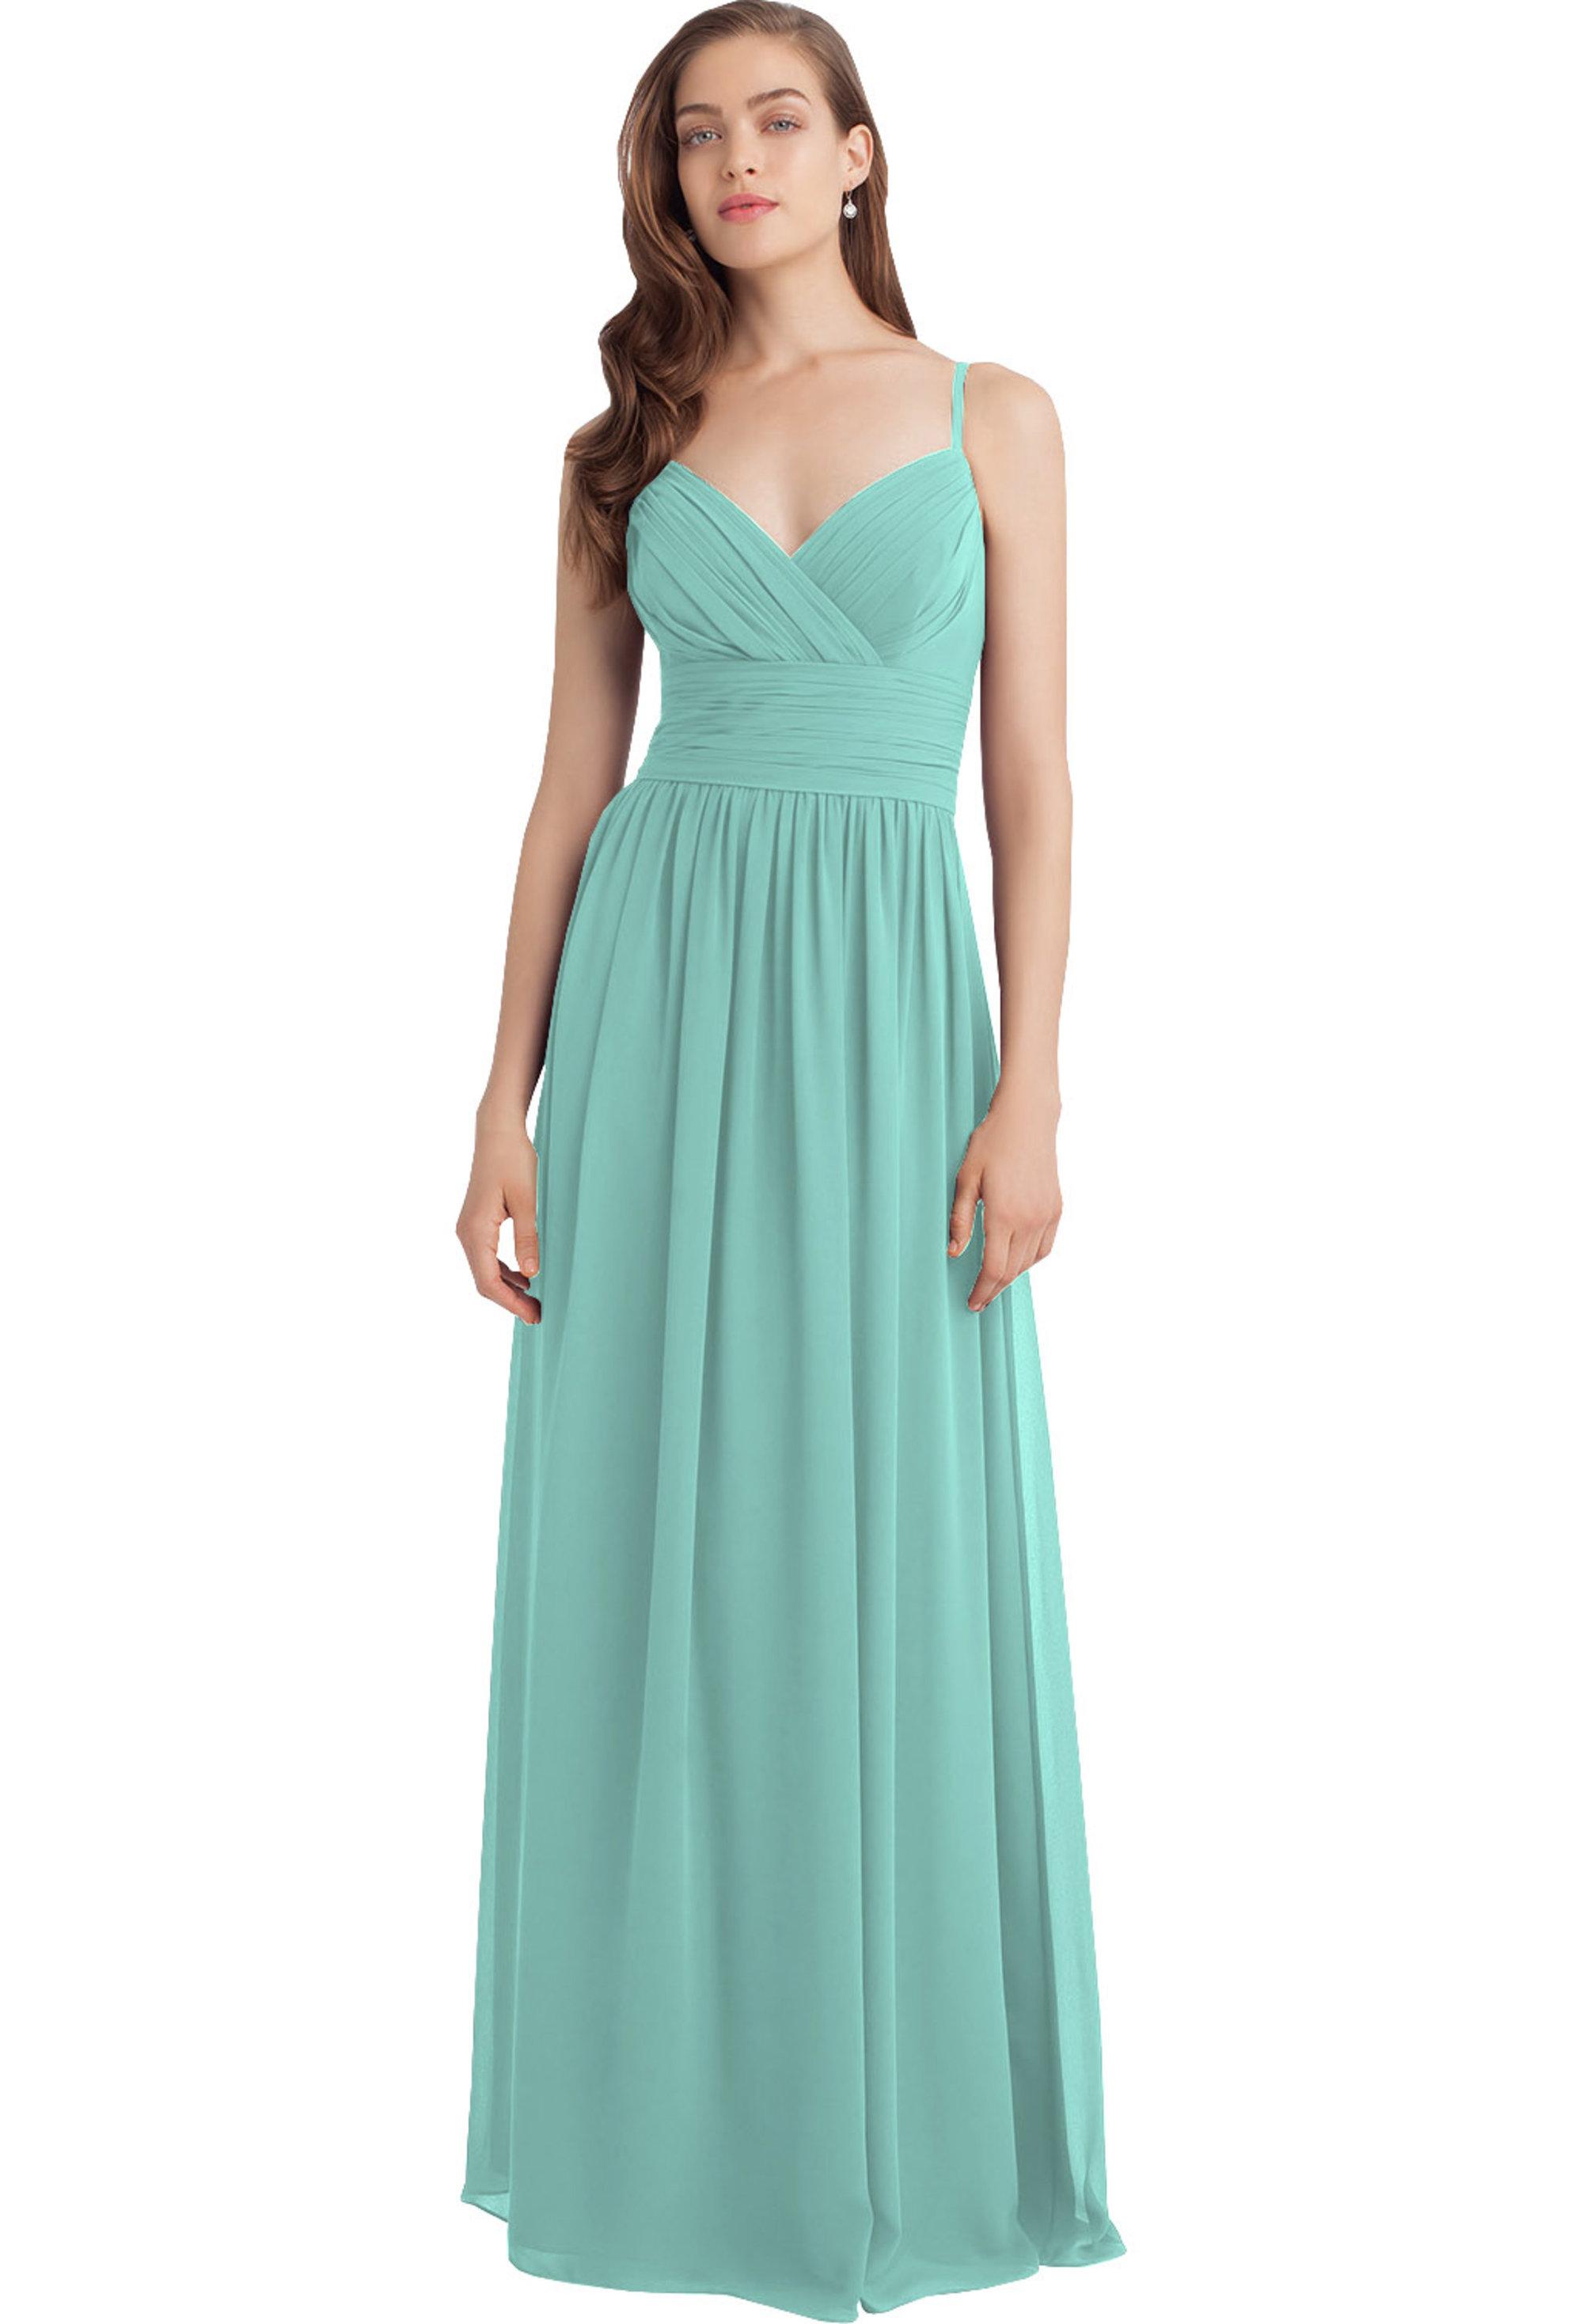 Bill Levkoff GLACIER Chiffon Sweetheart A-line gown, $216.00 Front